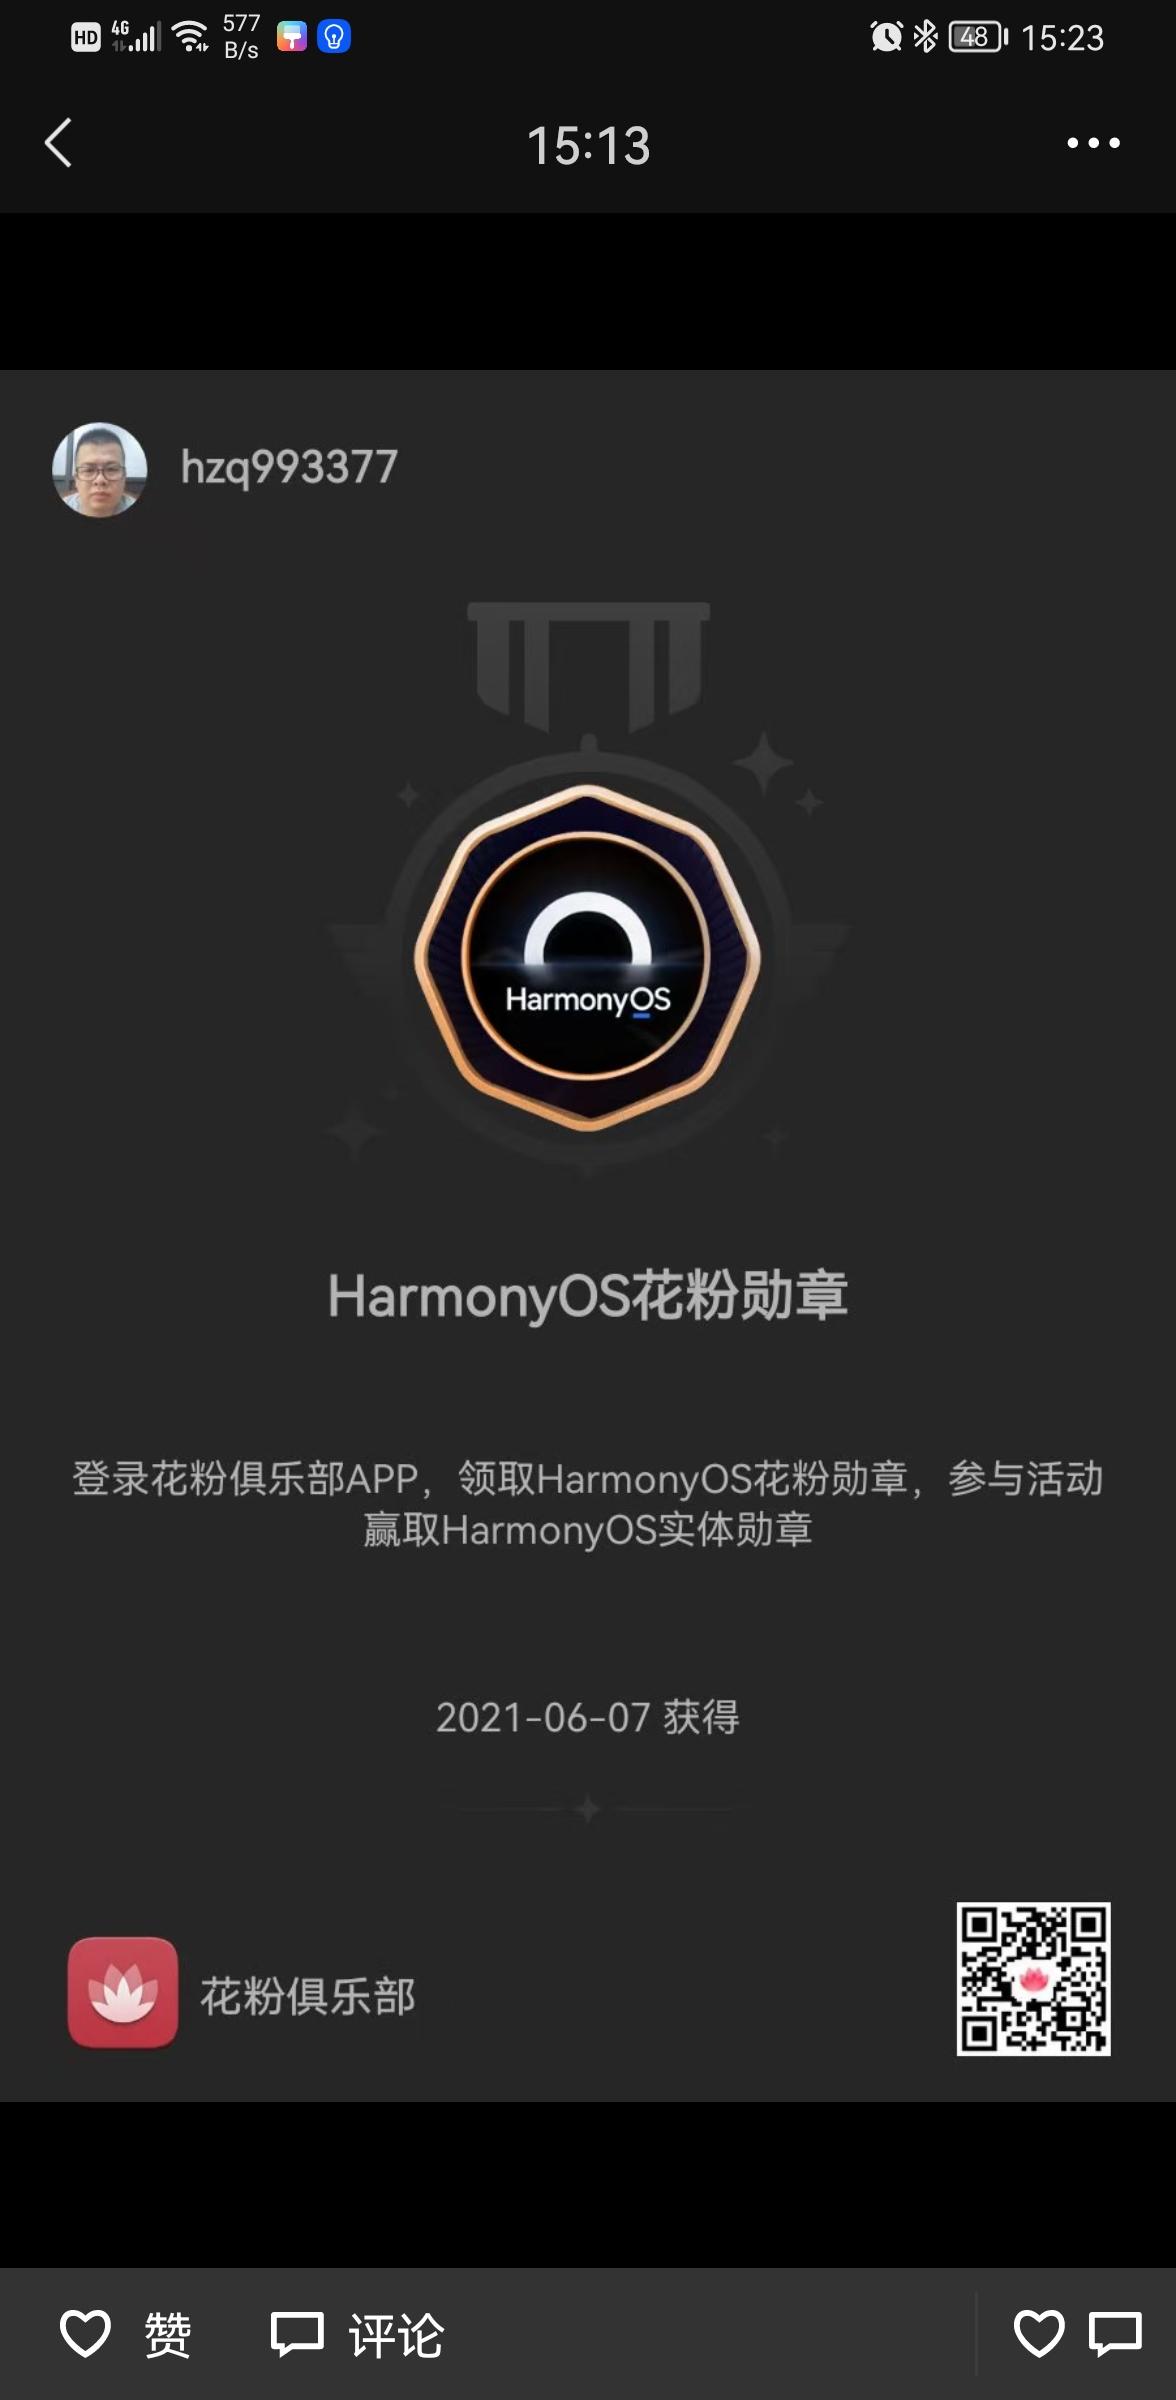 Screenshot_20210812_152301_com.tencent.mm.jpg